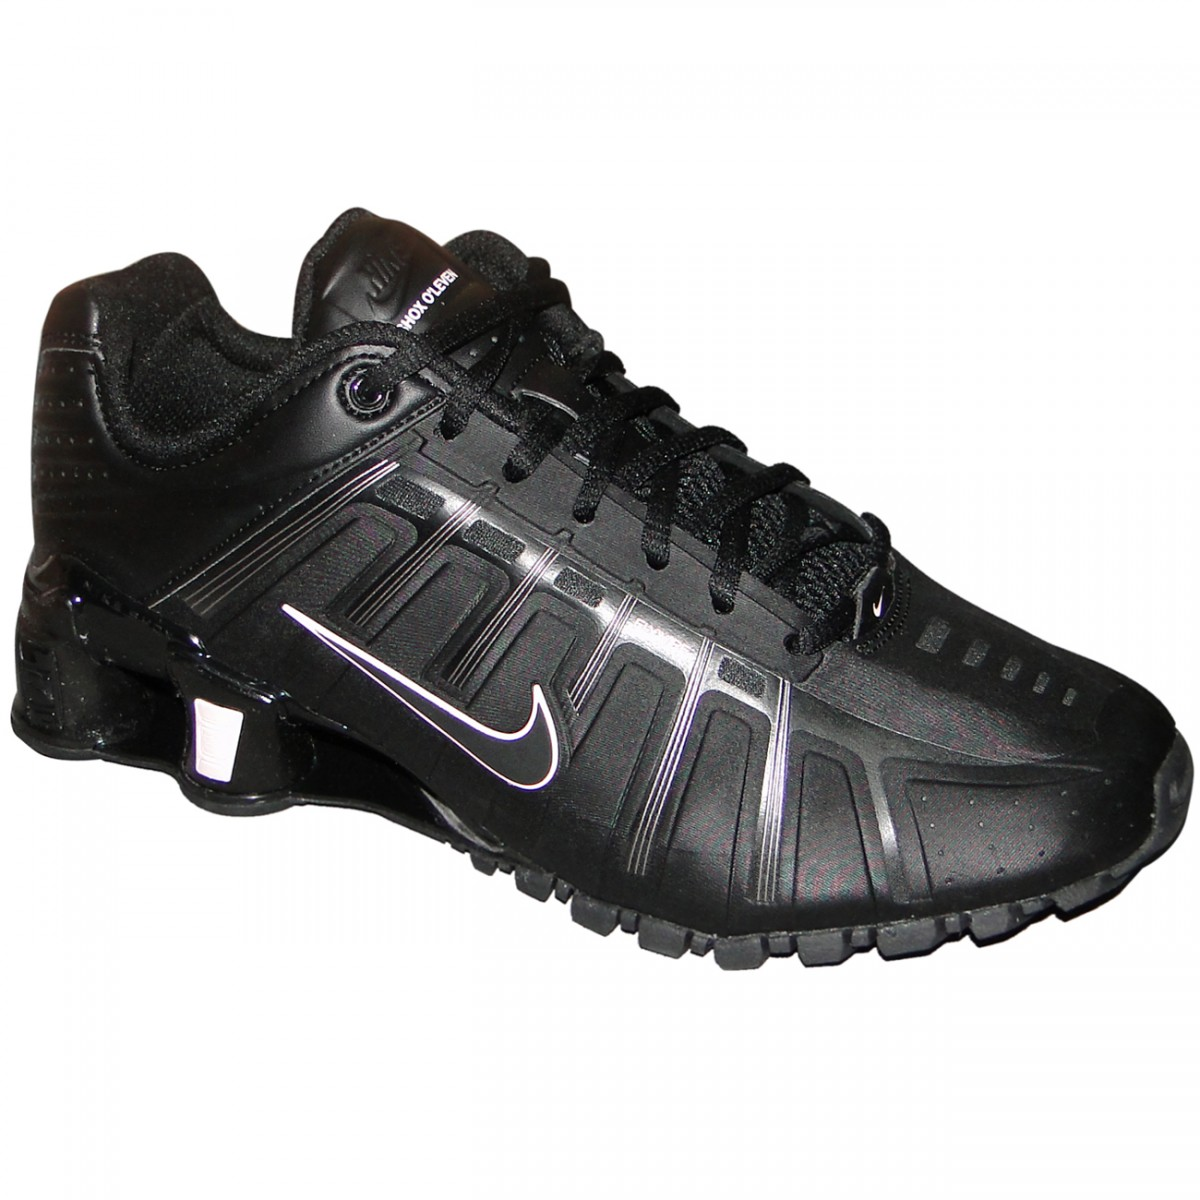 51d0eb30c564 Tênis Nike Shox O leven 3181 - PRETO ROSA - Chuteira Nike